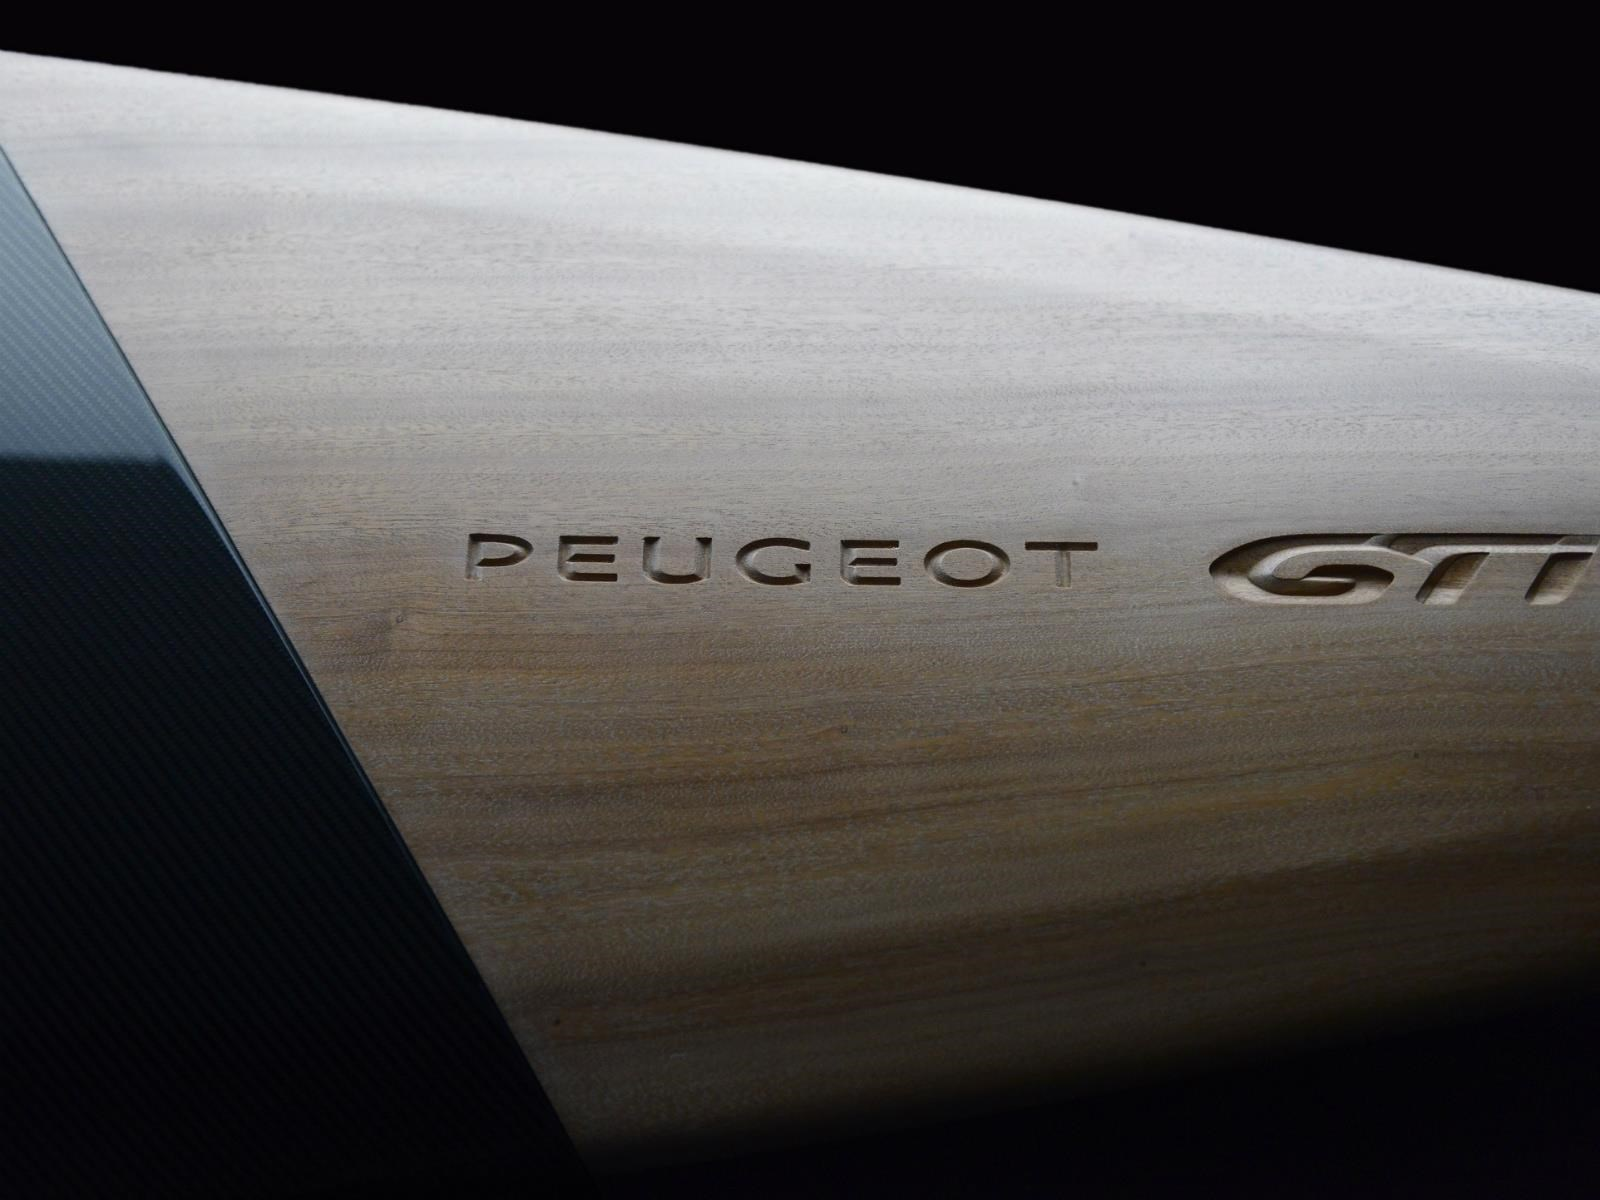 Peugeot GTi Surfboard Concept, León en el agua